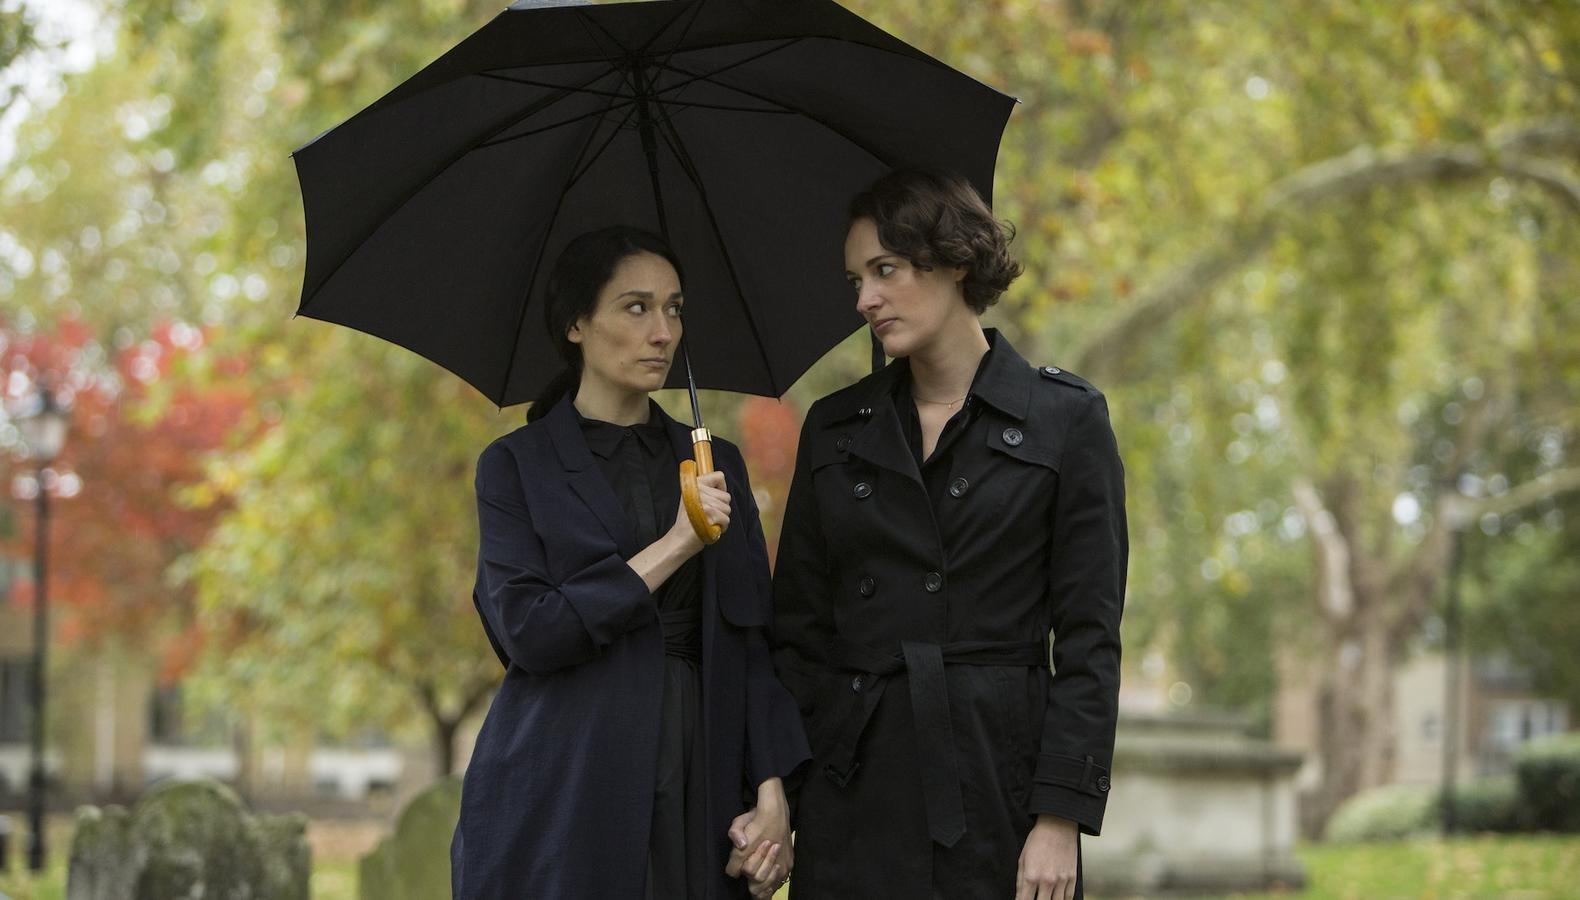 'Fleabag,' 'Game of Thrones,' Waller-Bridge + Comer Win at 71st Emmy Awards